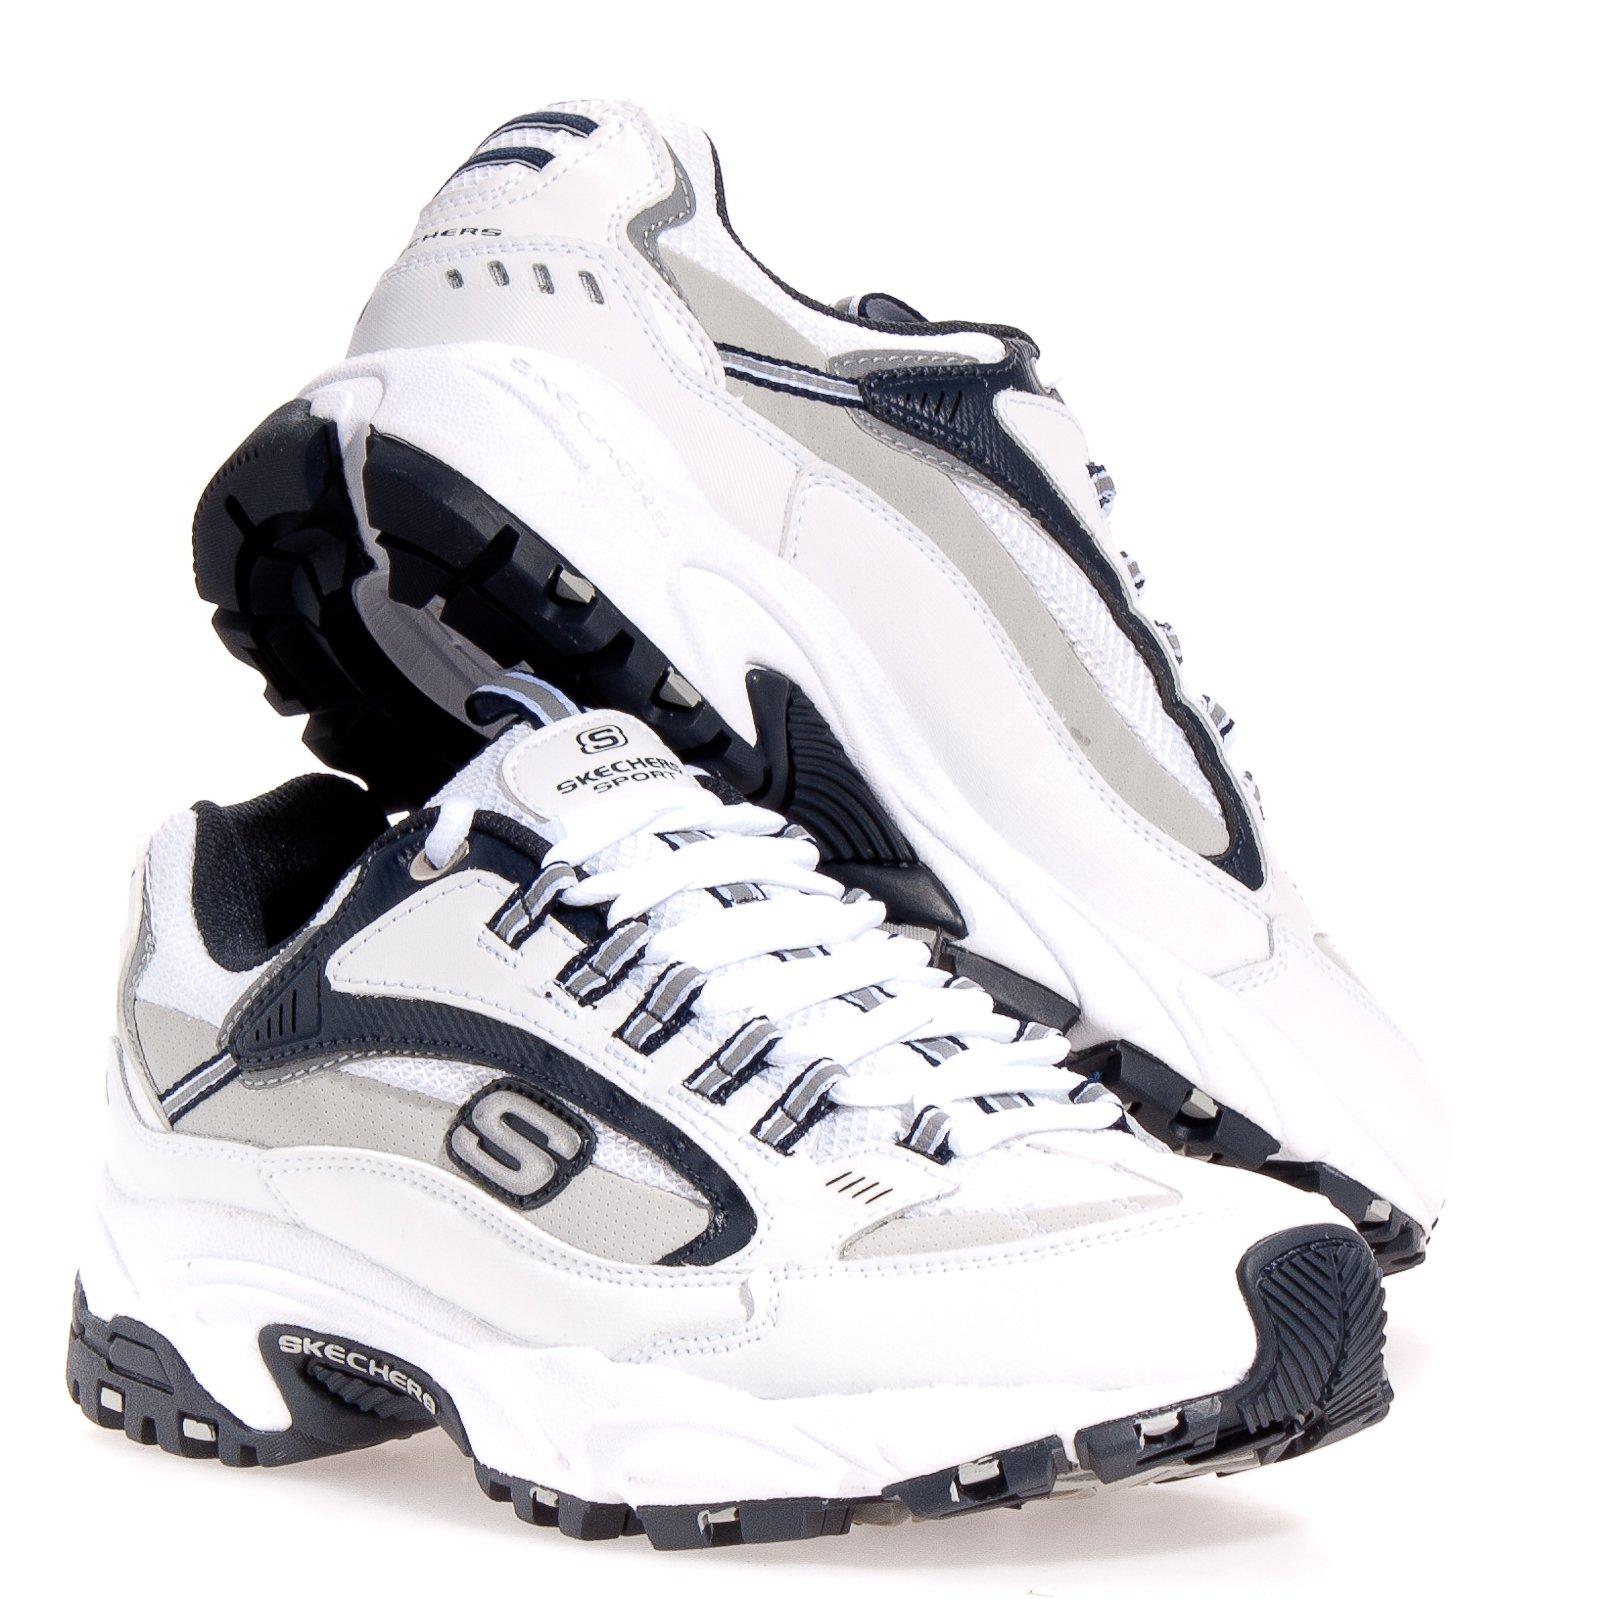 aeeab7e6fea9 Galleon - Skechers Sport Men s Stamina Nuovo Cutback Lace-Up Sneaker ...